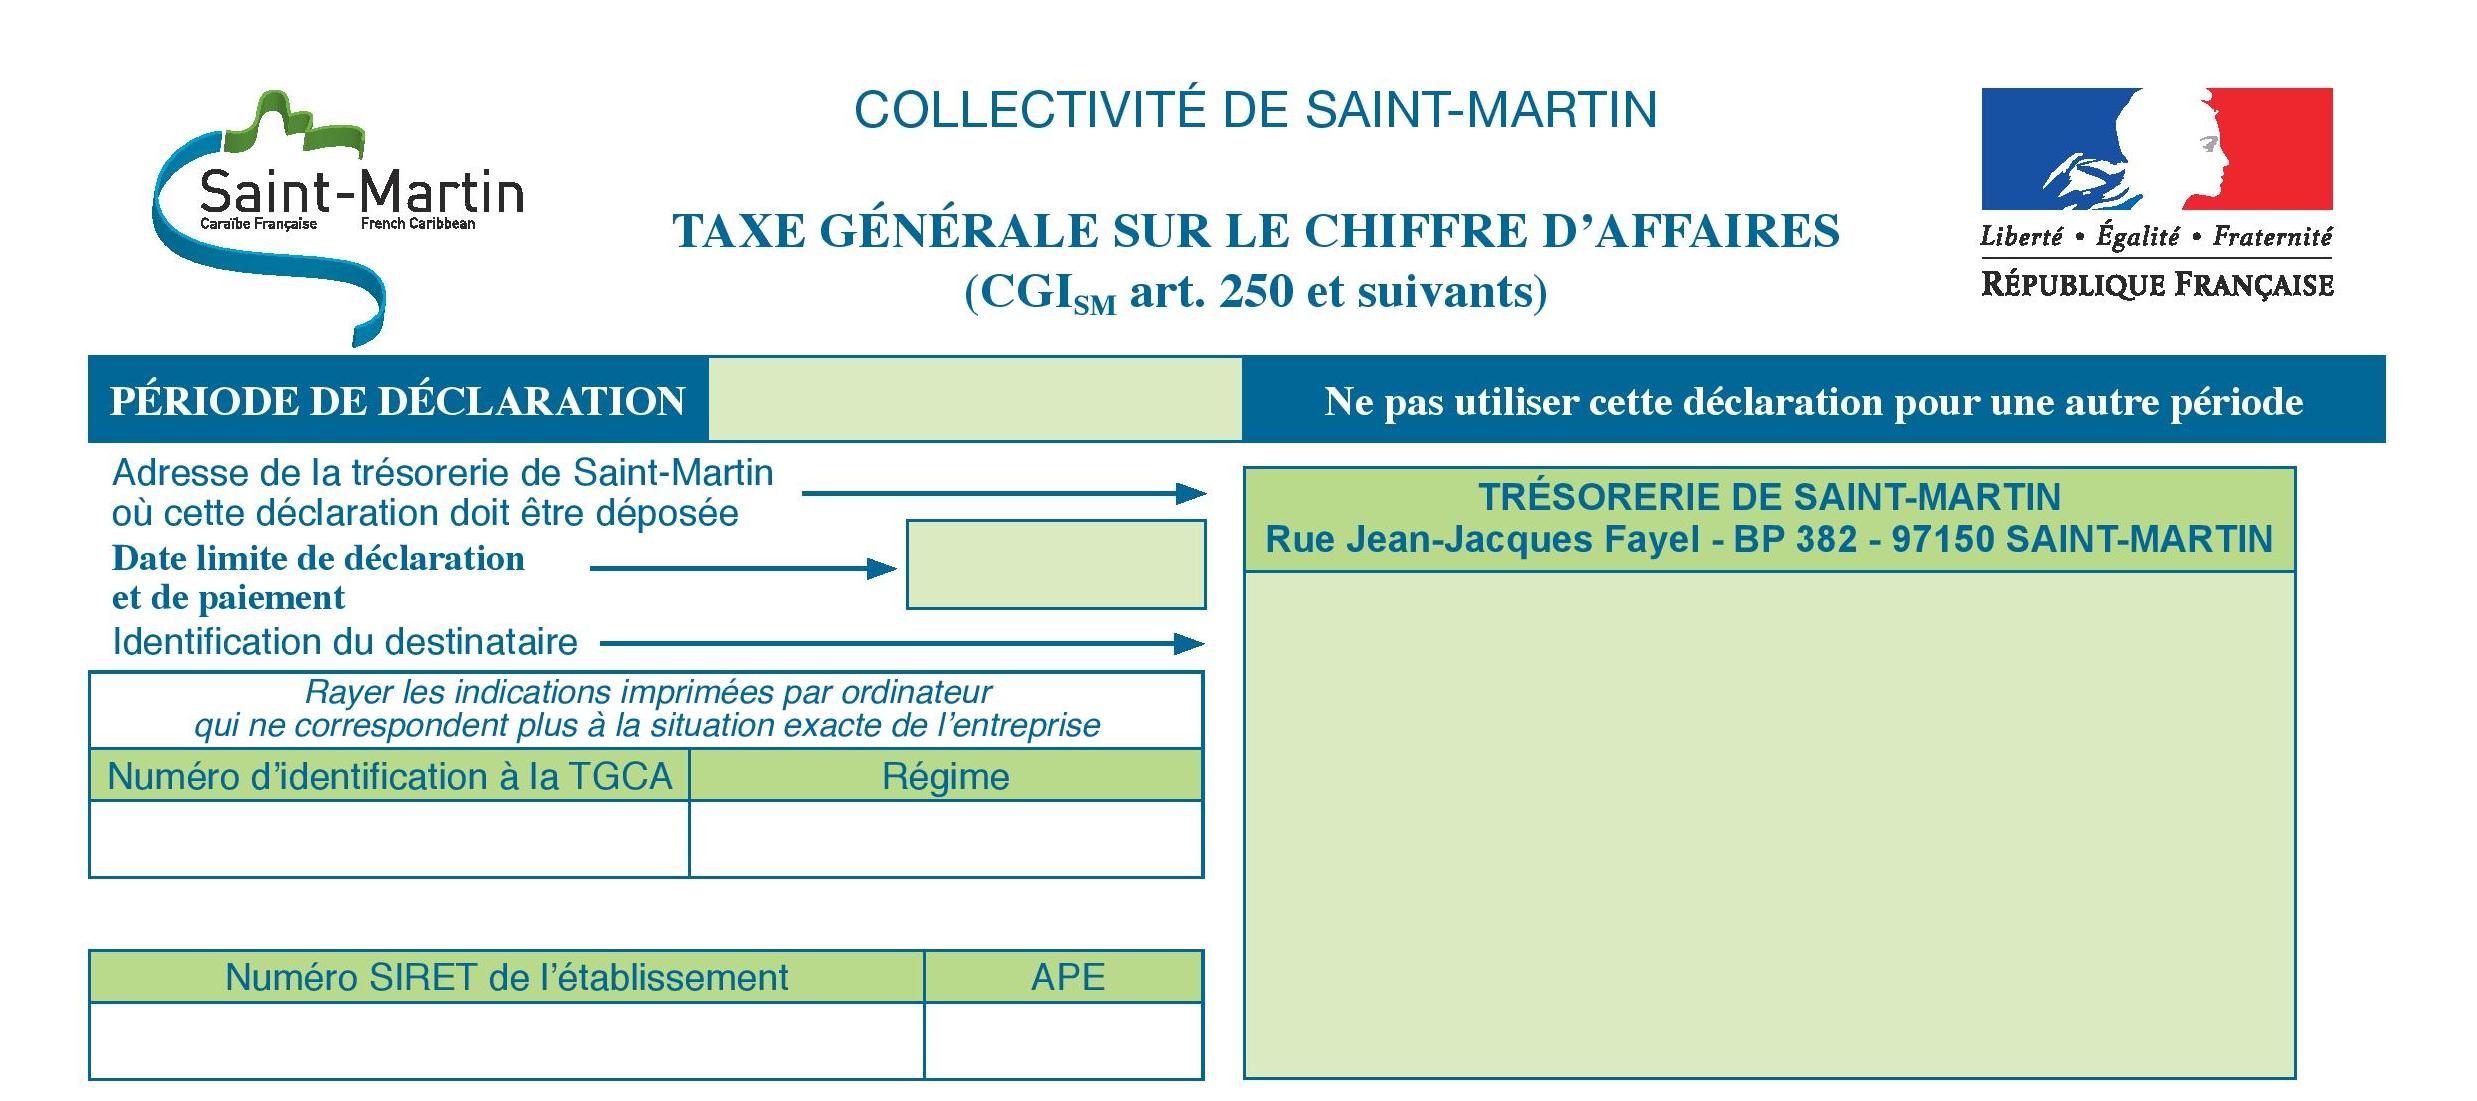 Collectivite De Saint Martin Antilles Francaise